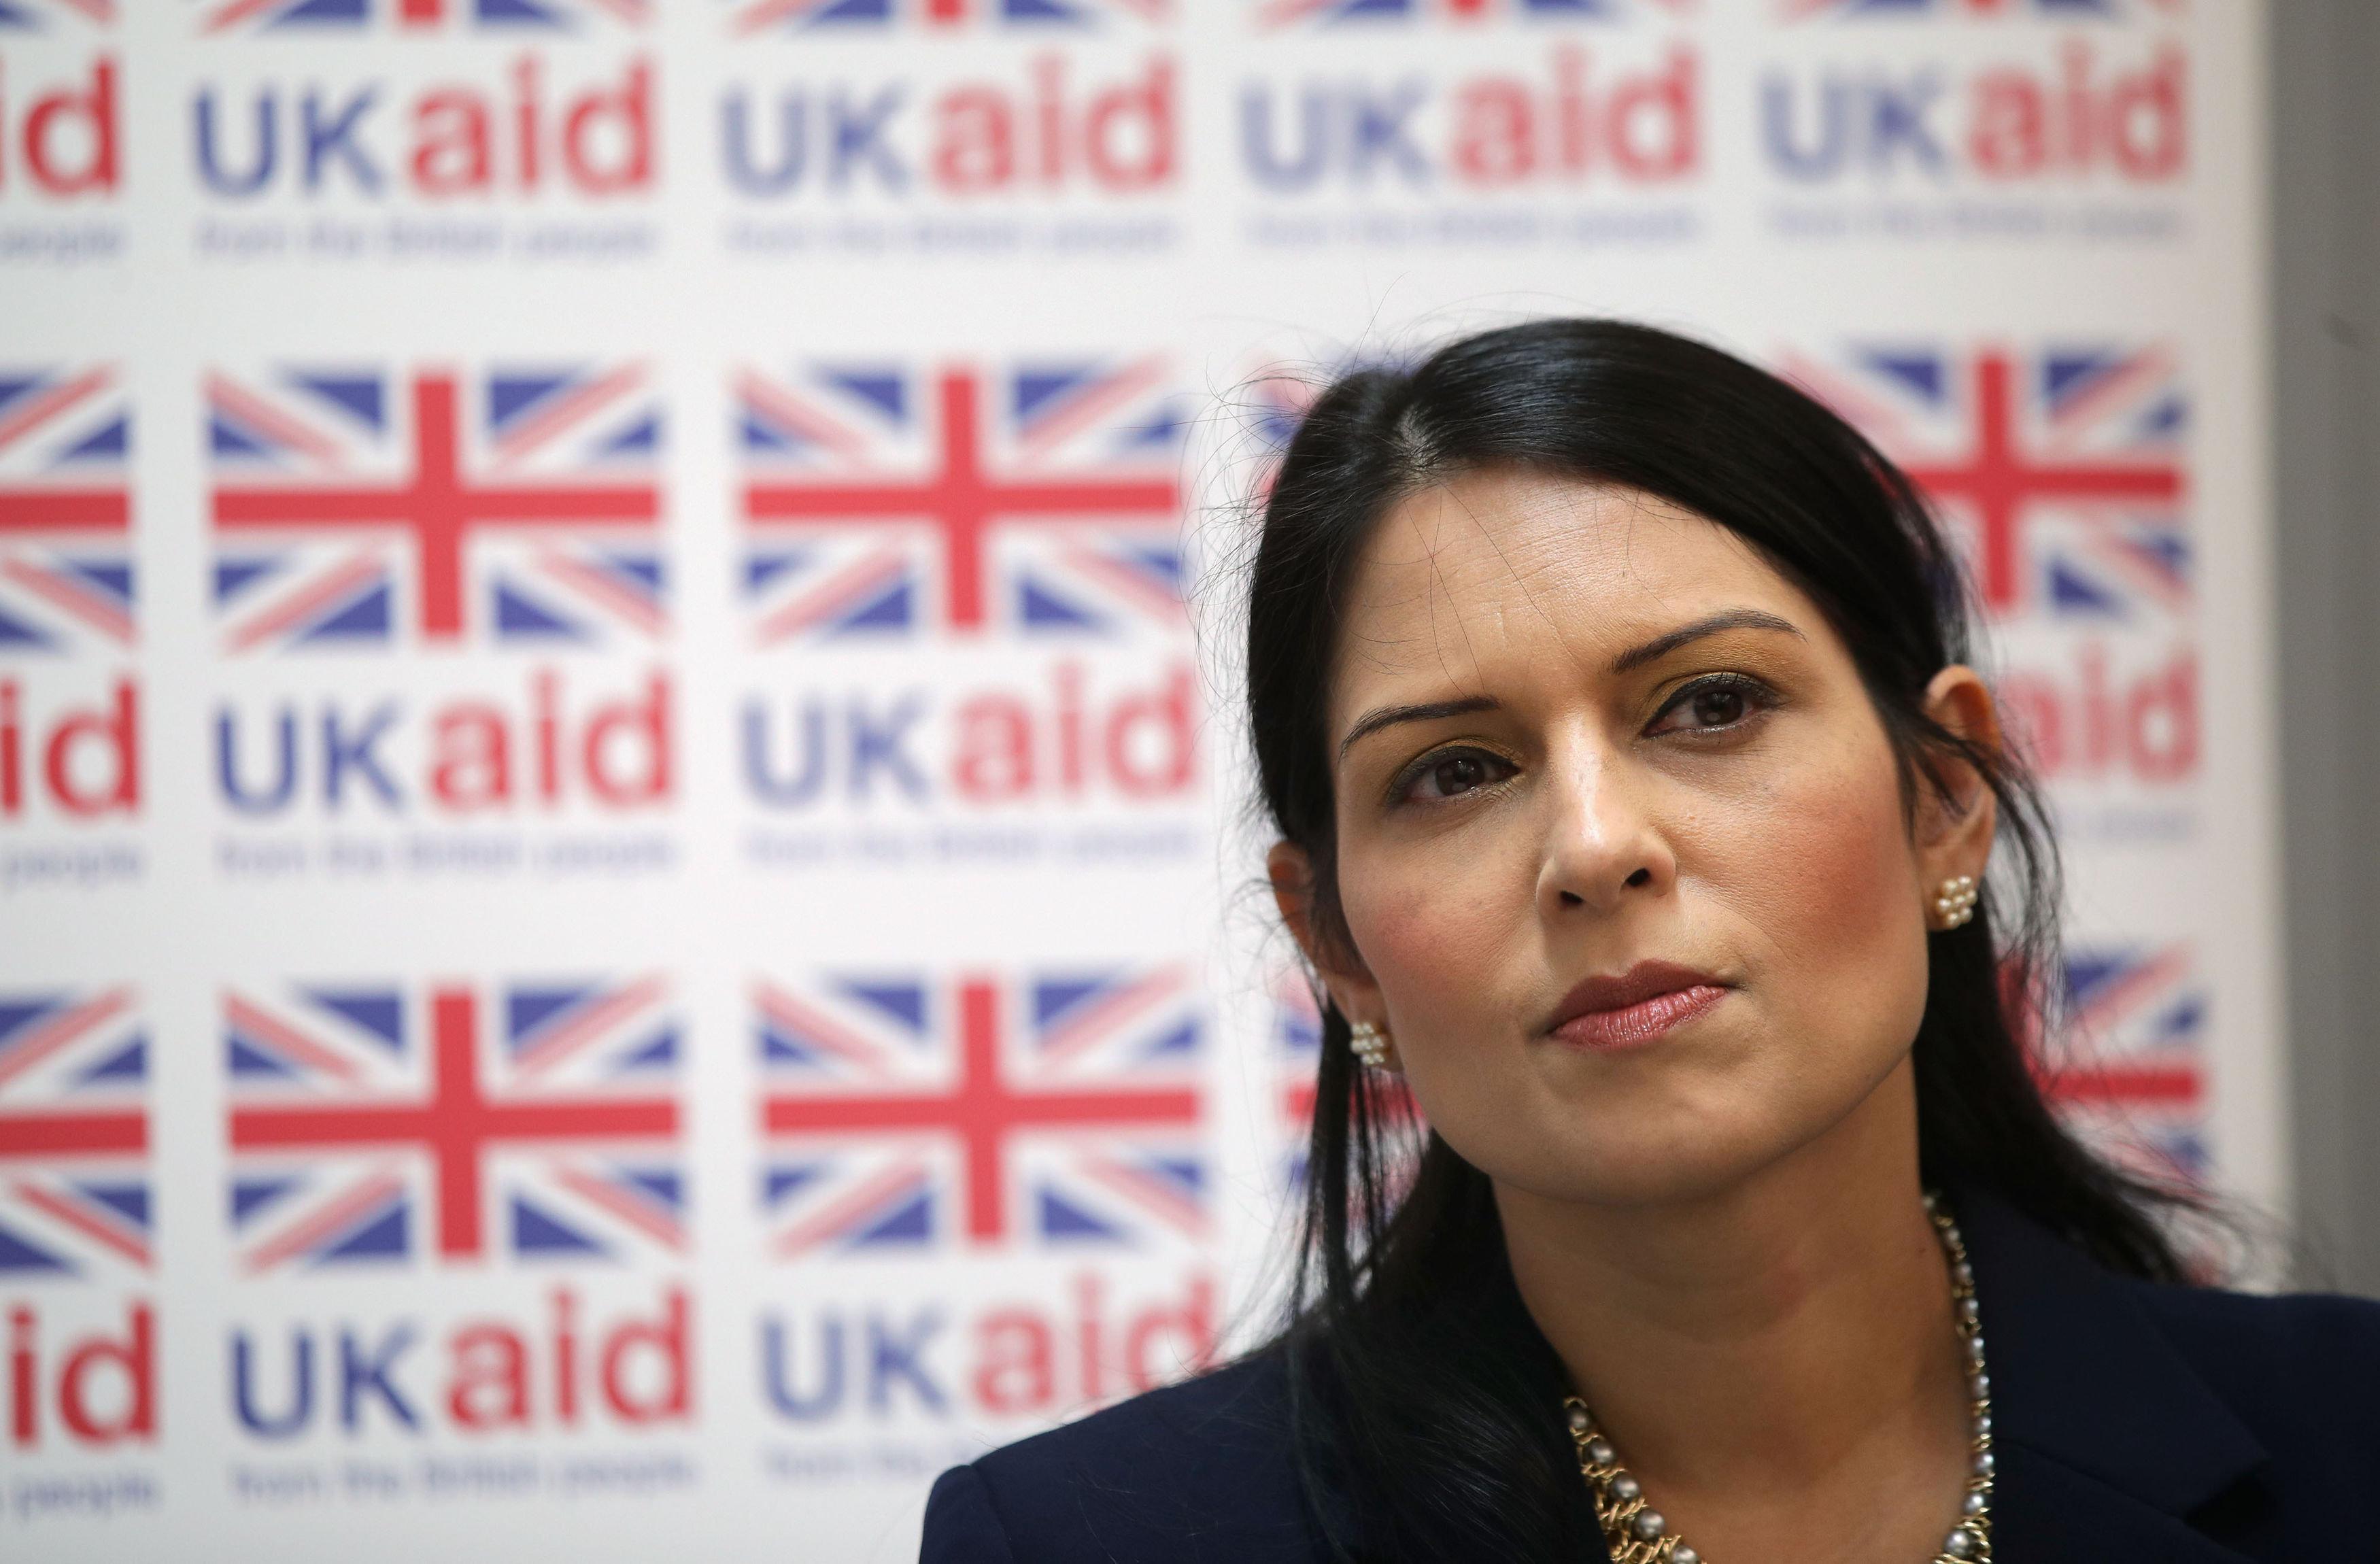 Priti Patel is flying back to the UK amid mounting expectation she will be sacked as International Development Secretary